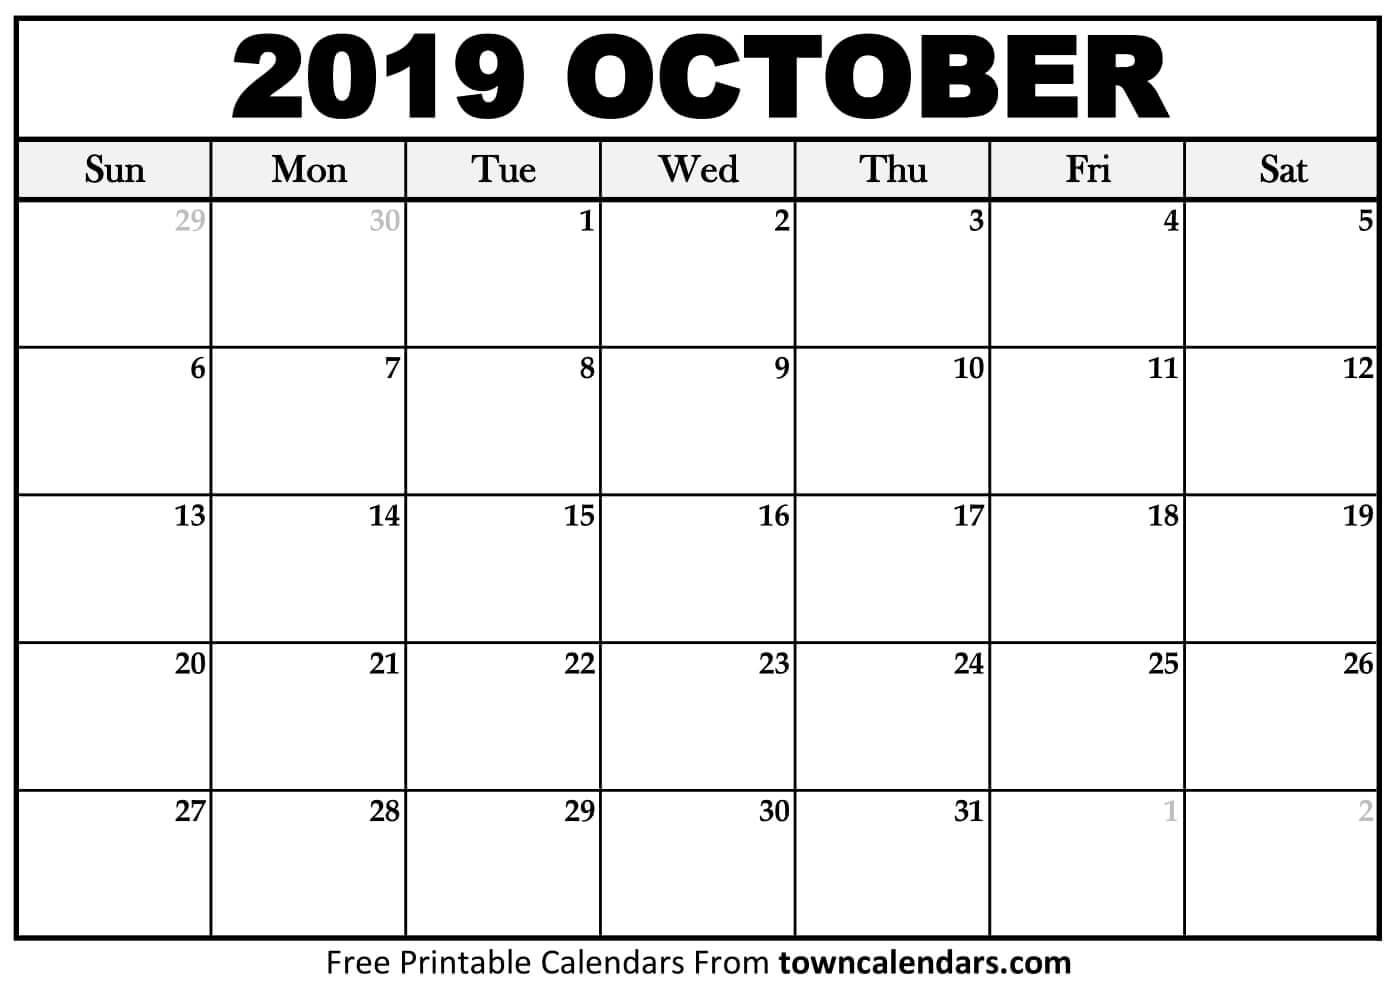 Printable October 2019 Calendar - Towncalendars